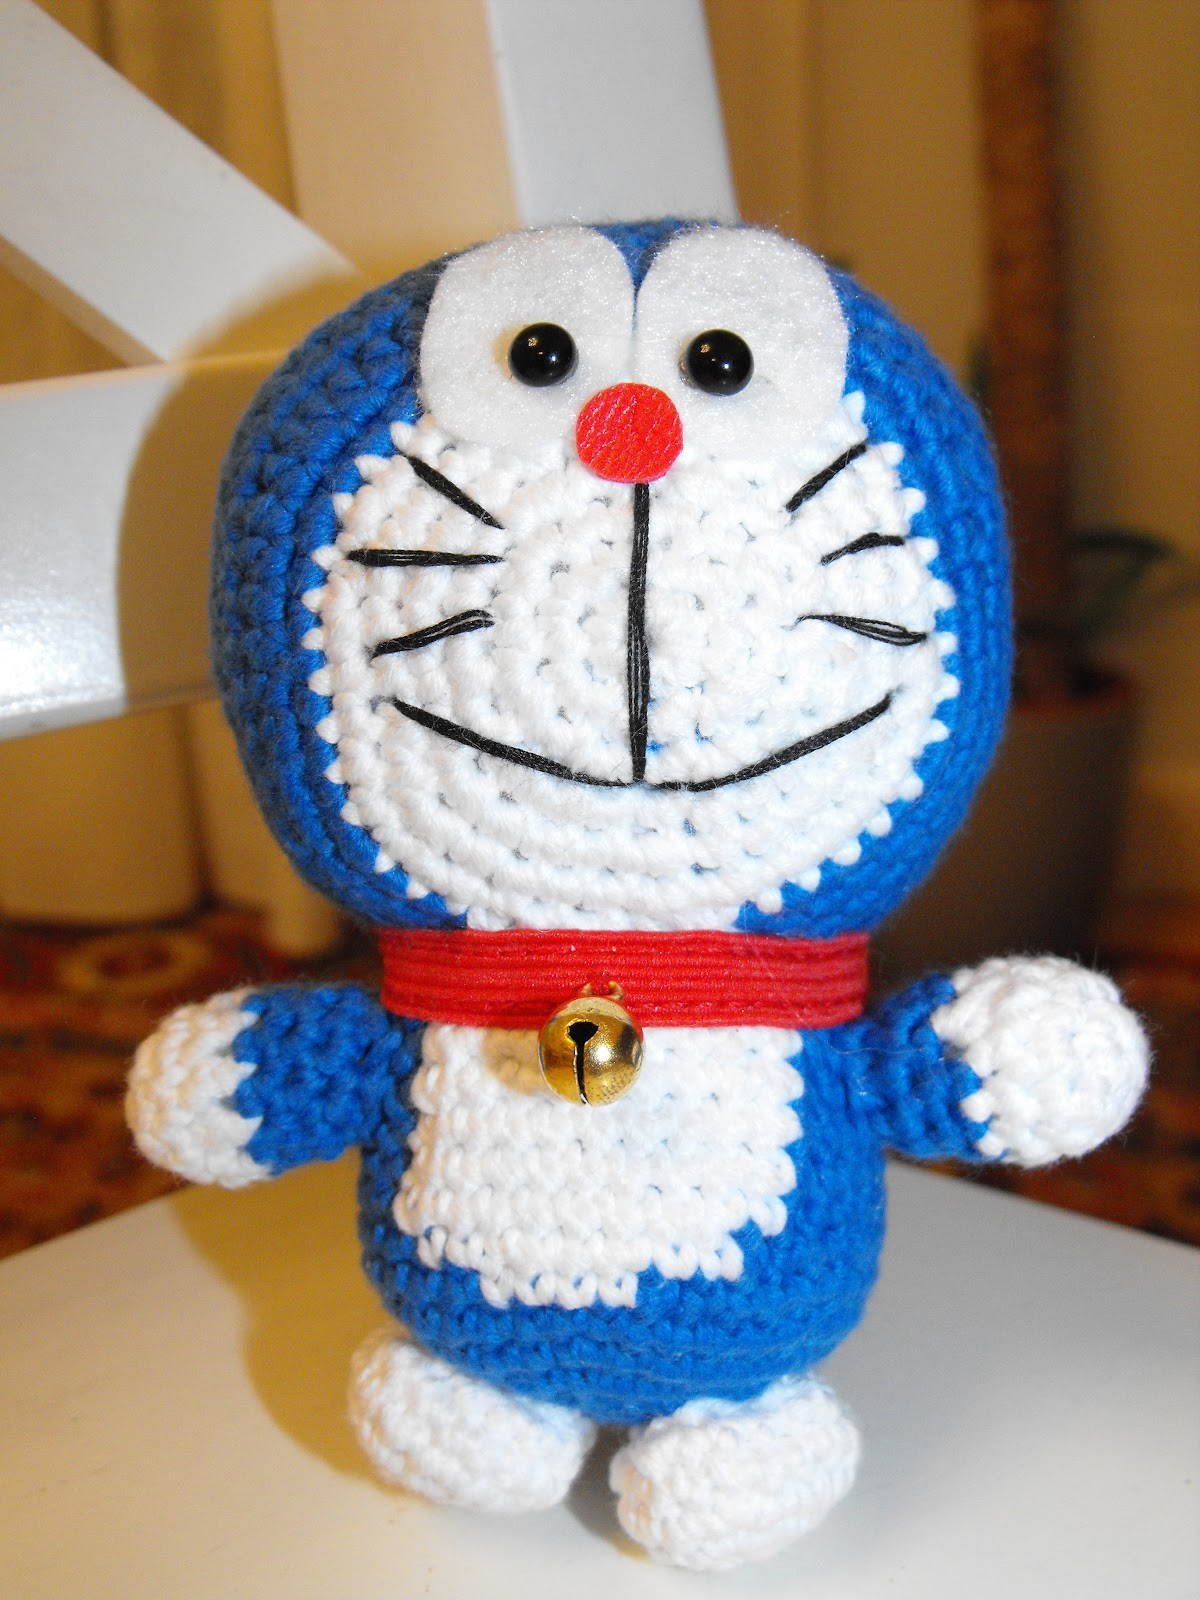 Amigurumi Doraemon Tutorial : Las cosas de Misimisi: Doraemon amigurumi (patron)